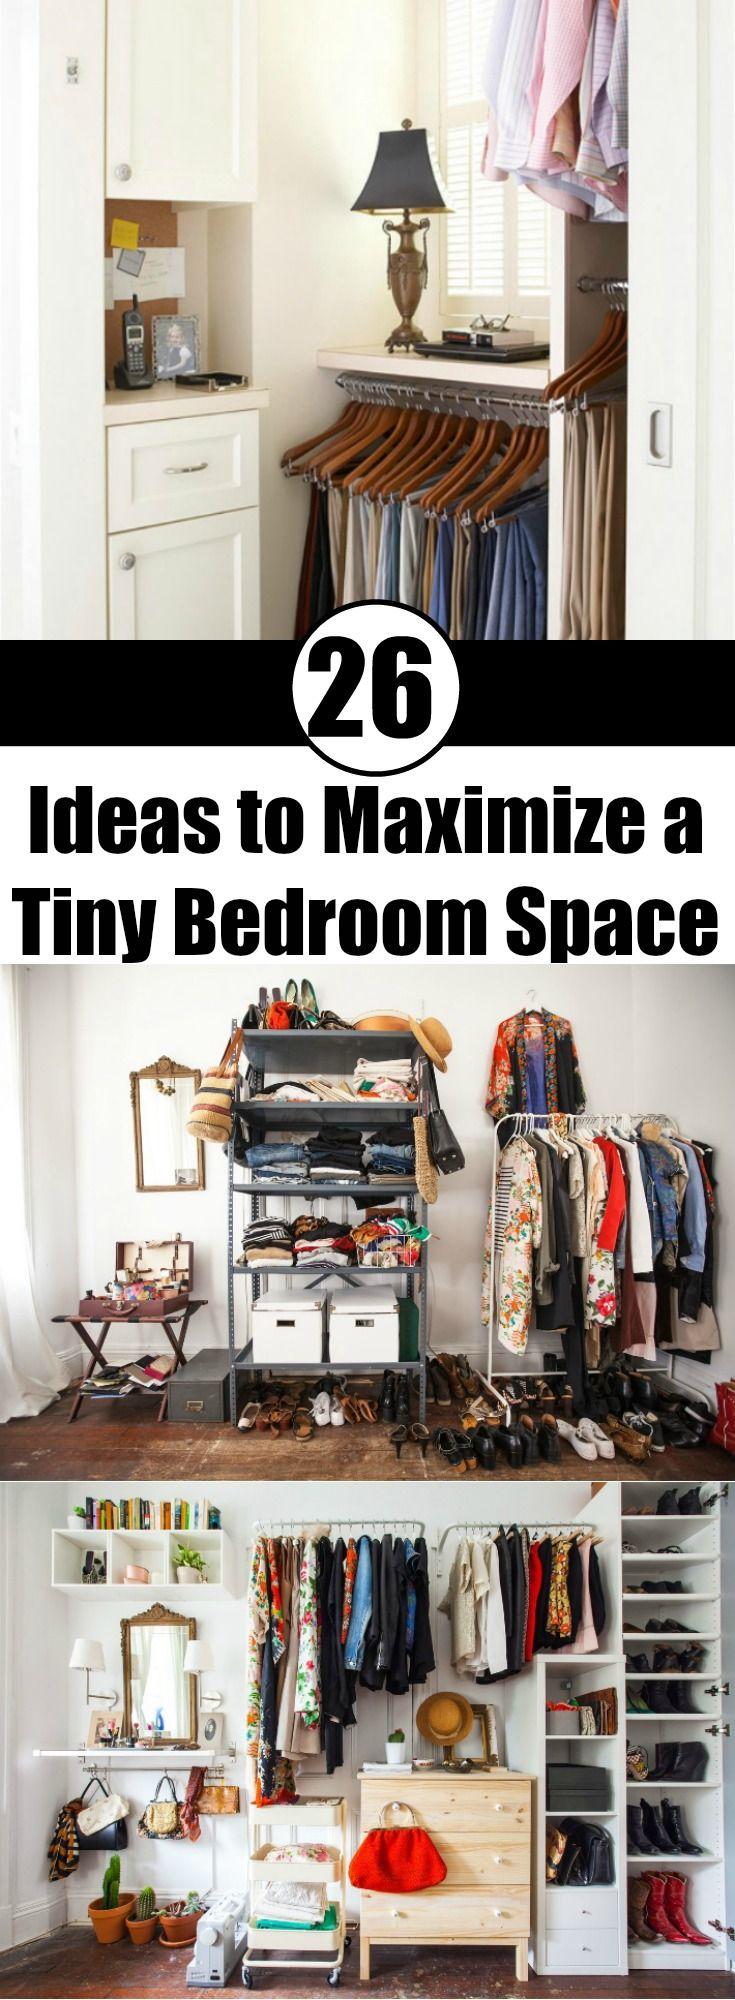 26 Ideas to Maximize a Tiny Bedroom Space